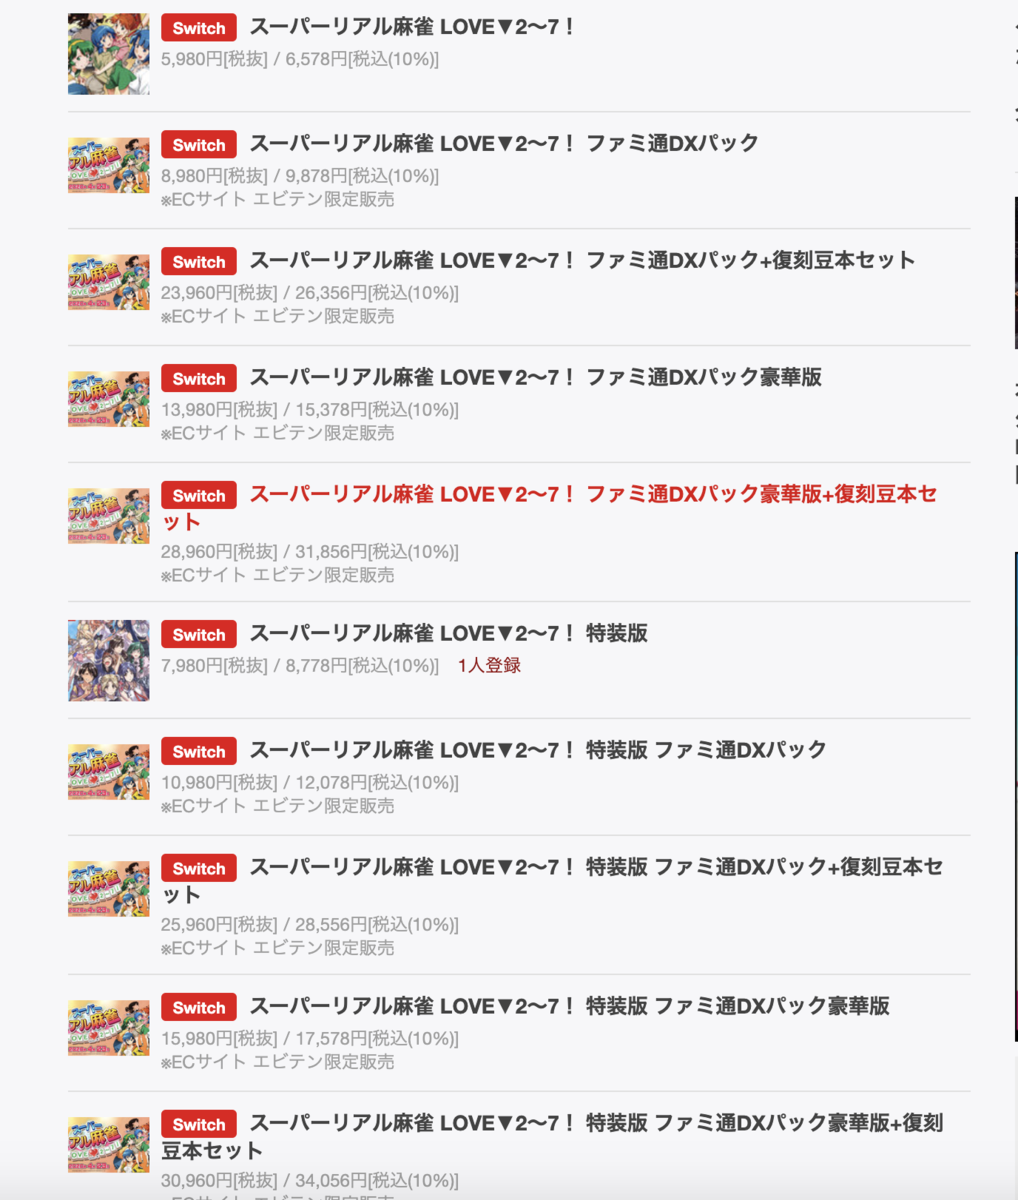 f:id:kuroichi-201:20200404080711p:plain